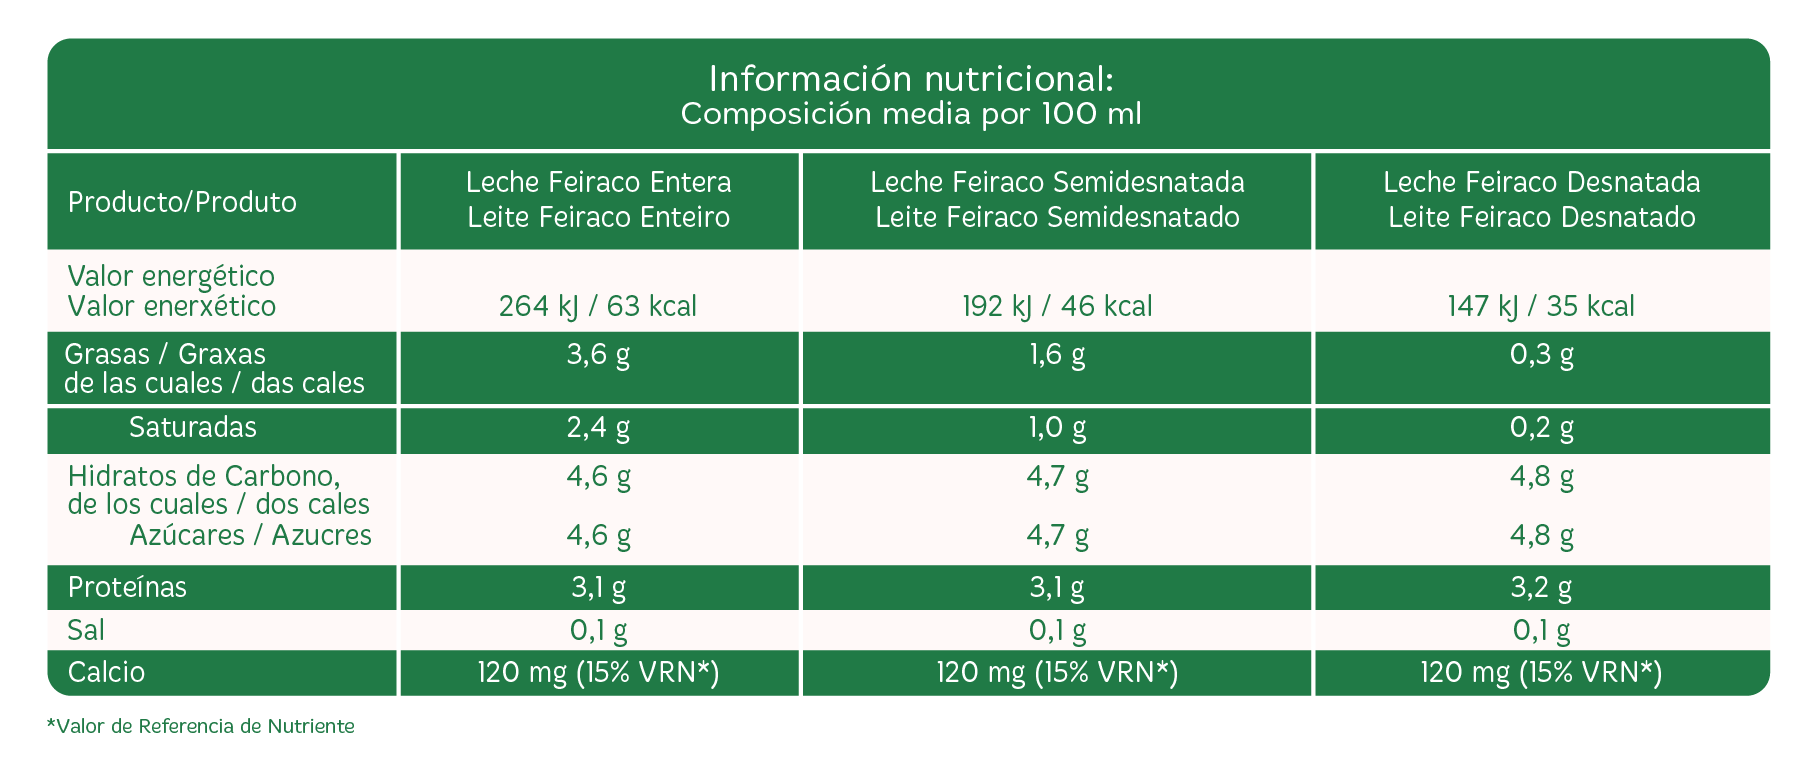 Ficha nutricional Leche Feiraco